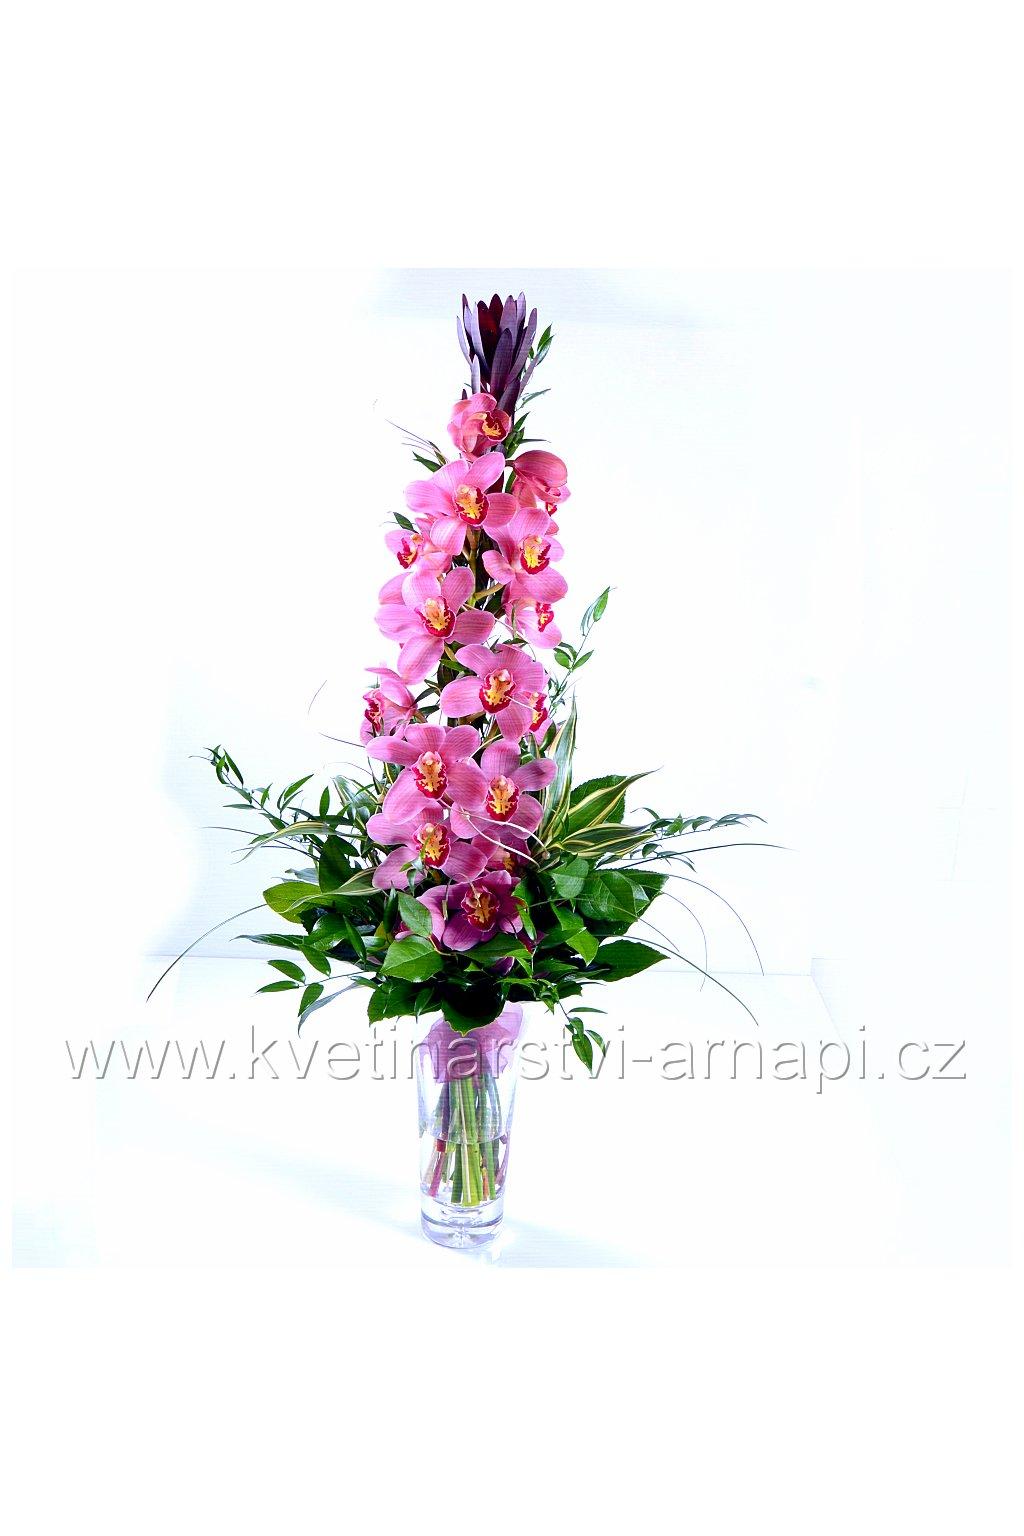 darkova kytice orchidej kvetinarstvi arnapi